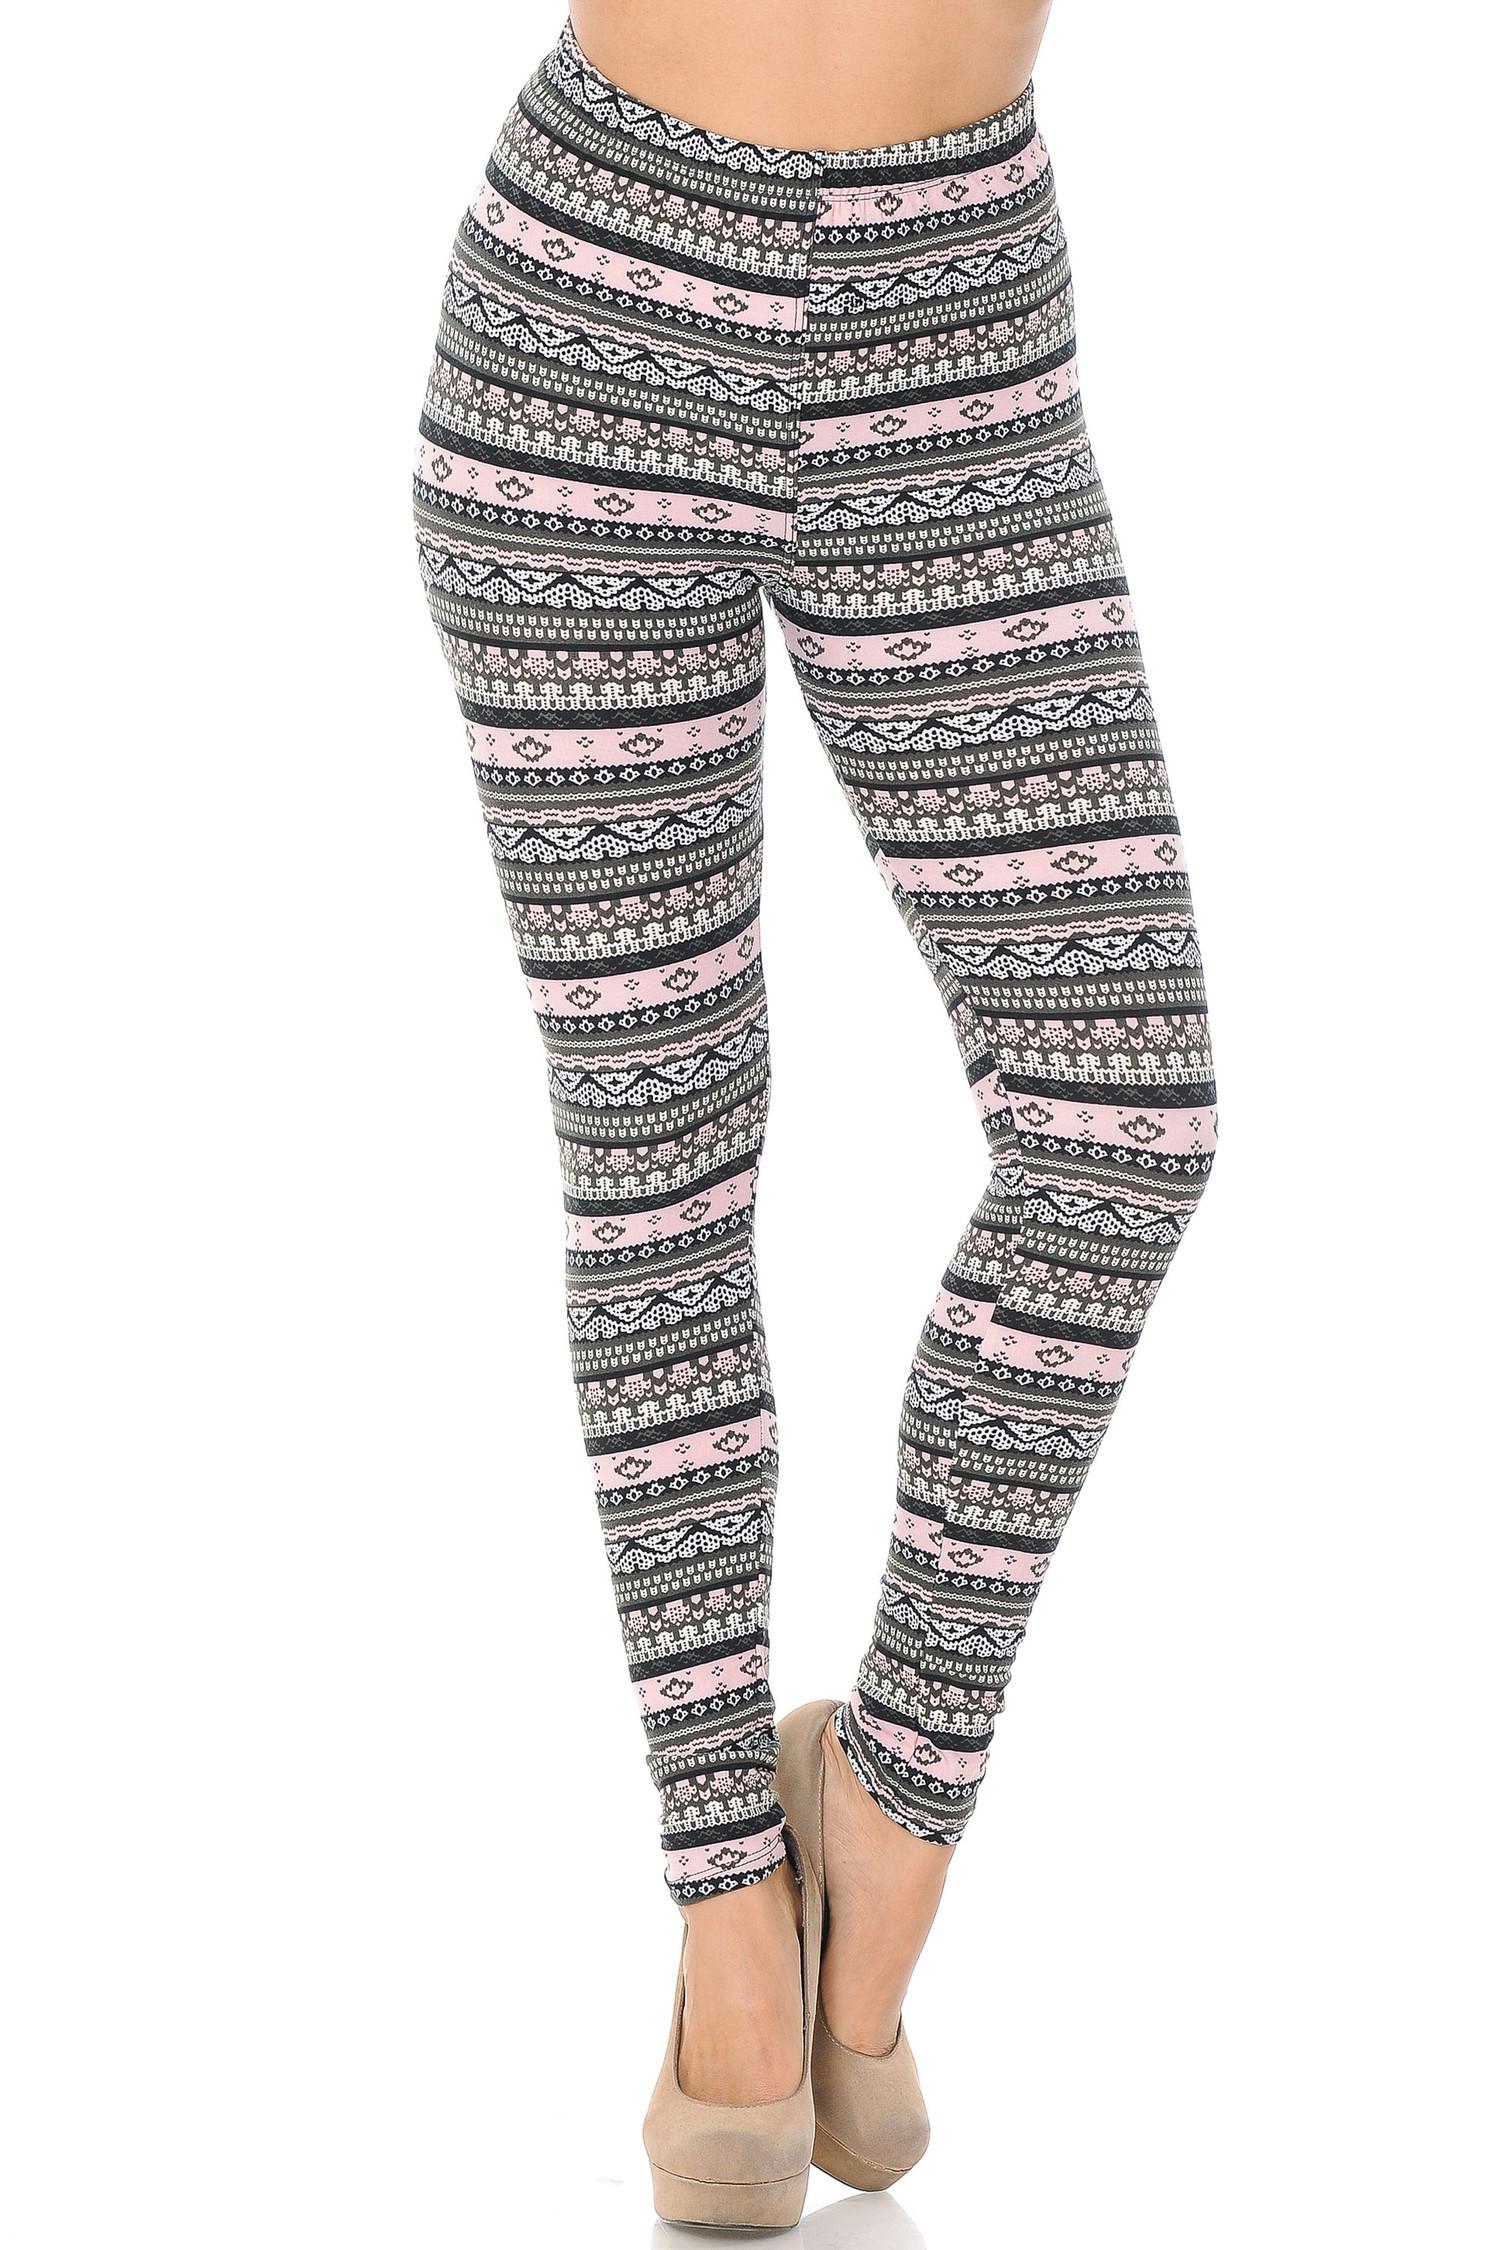 Brushed Dainty Pink Wrap Extra Plus Size Leggings - 3X-5X